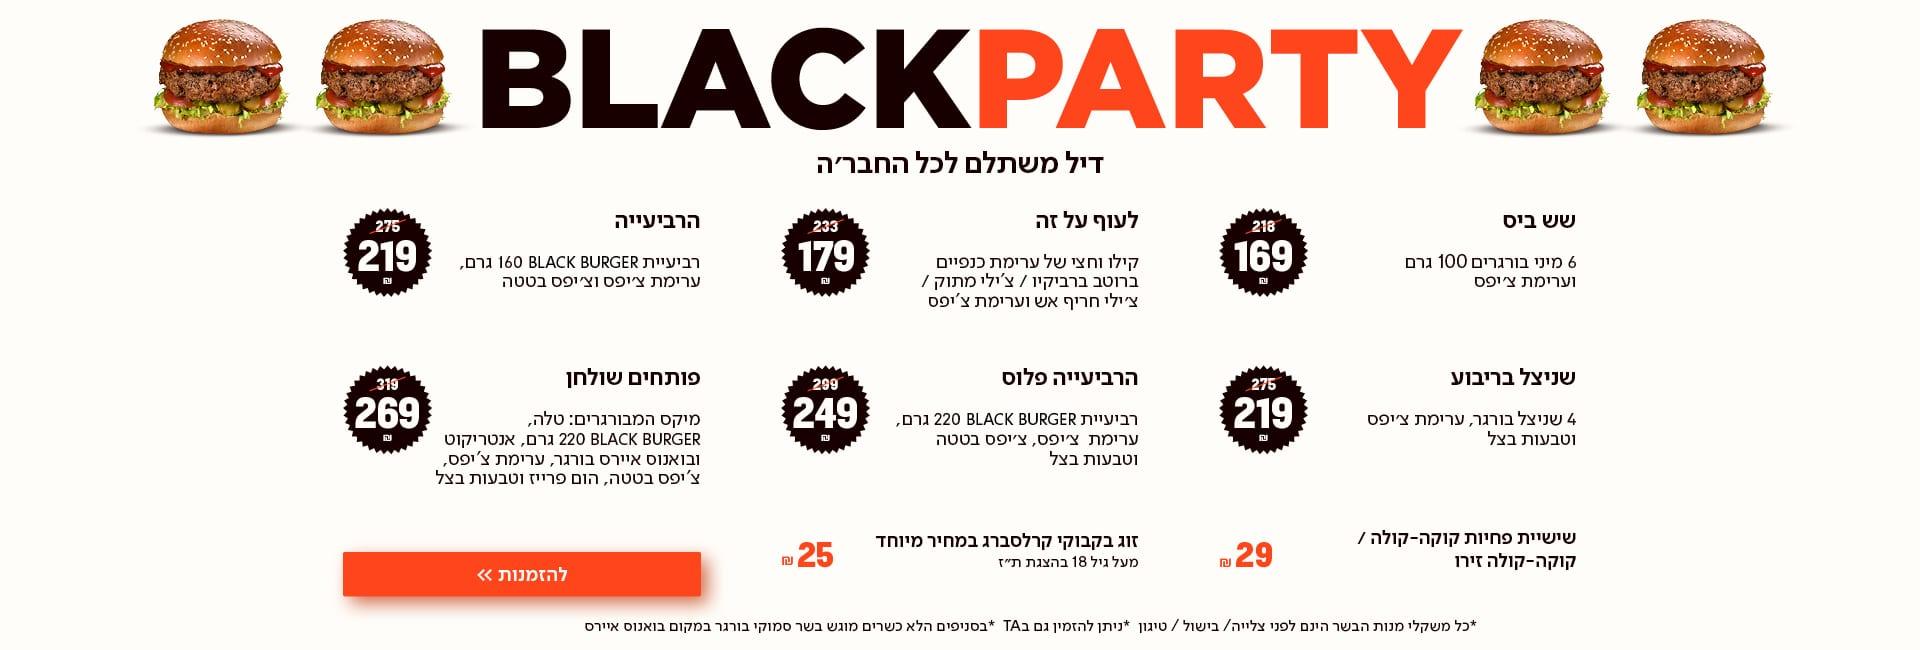 BLACK PARTY דיל משתלם לכל החבר'ה במשלוחים או טייק אווי